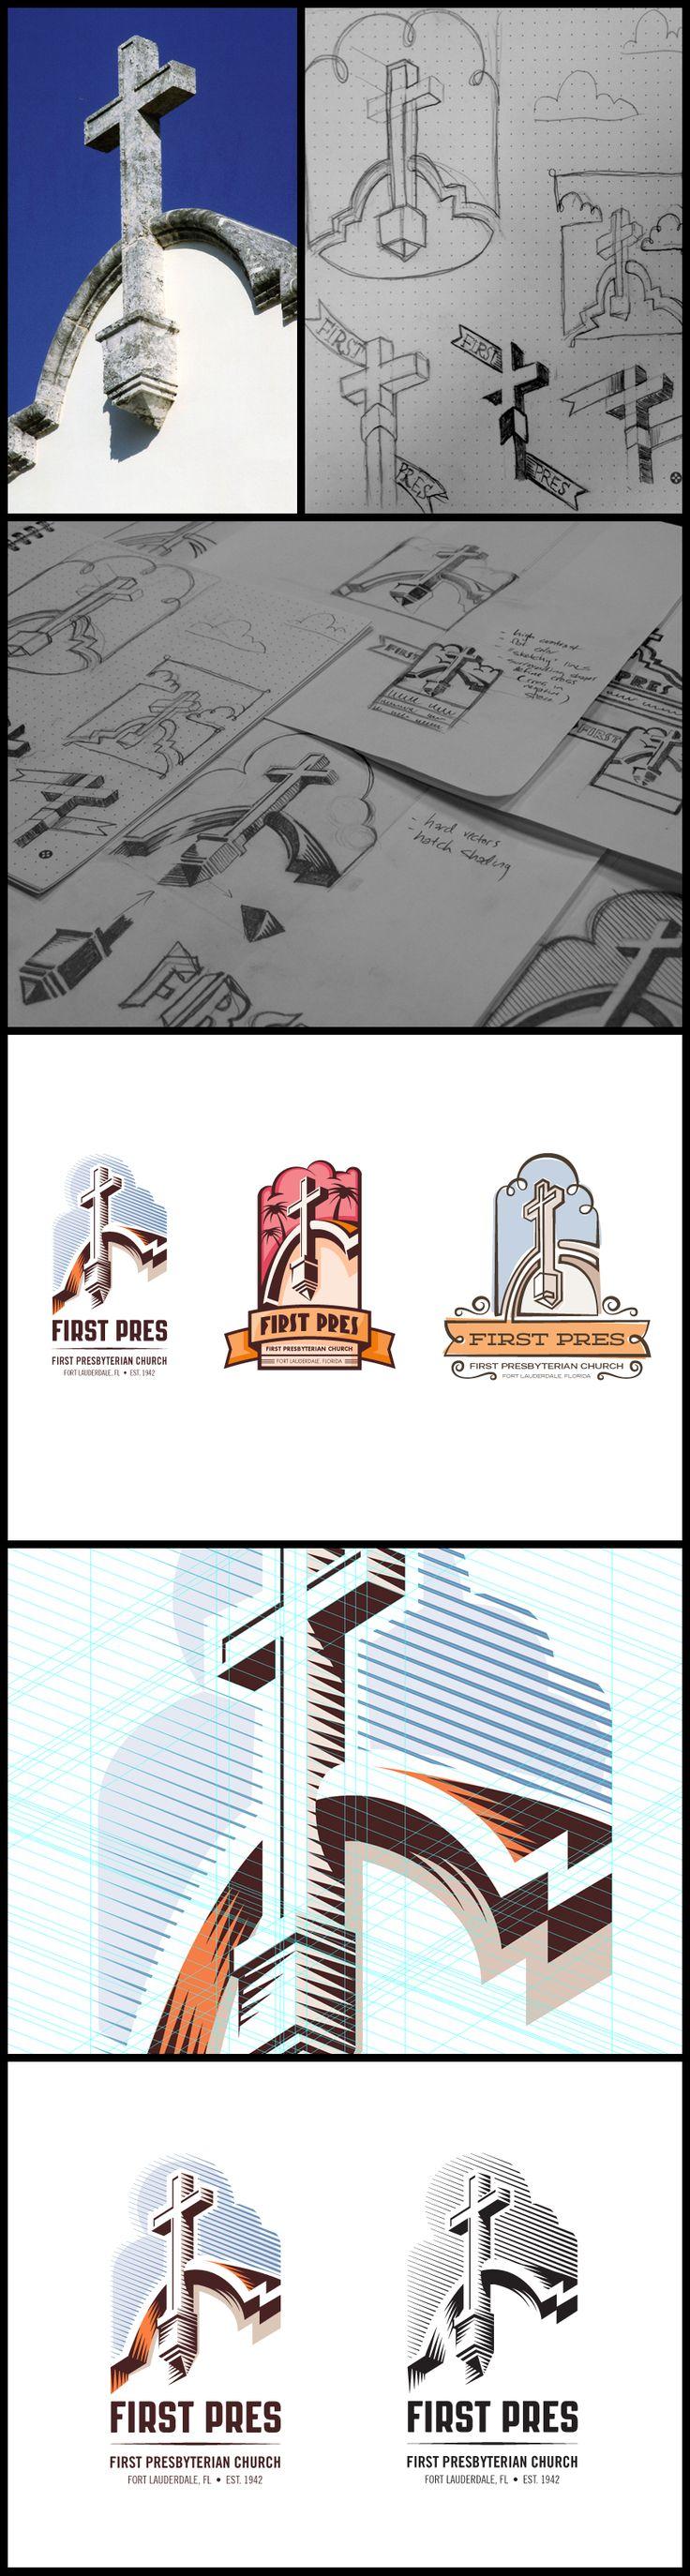 I love to see logo design progression